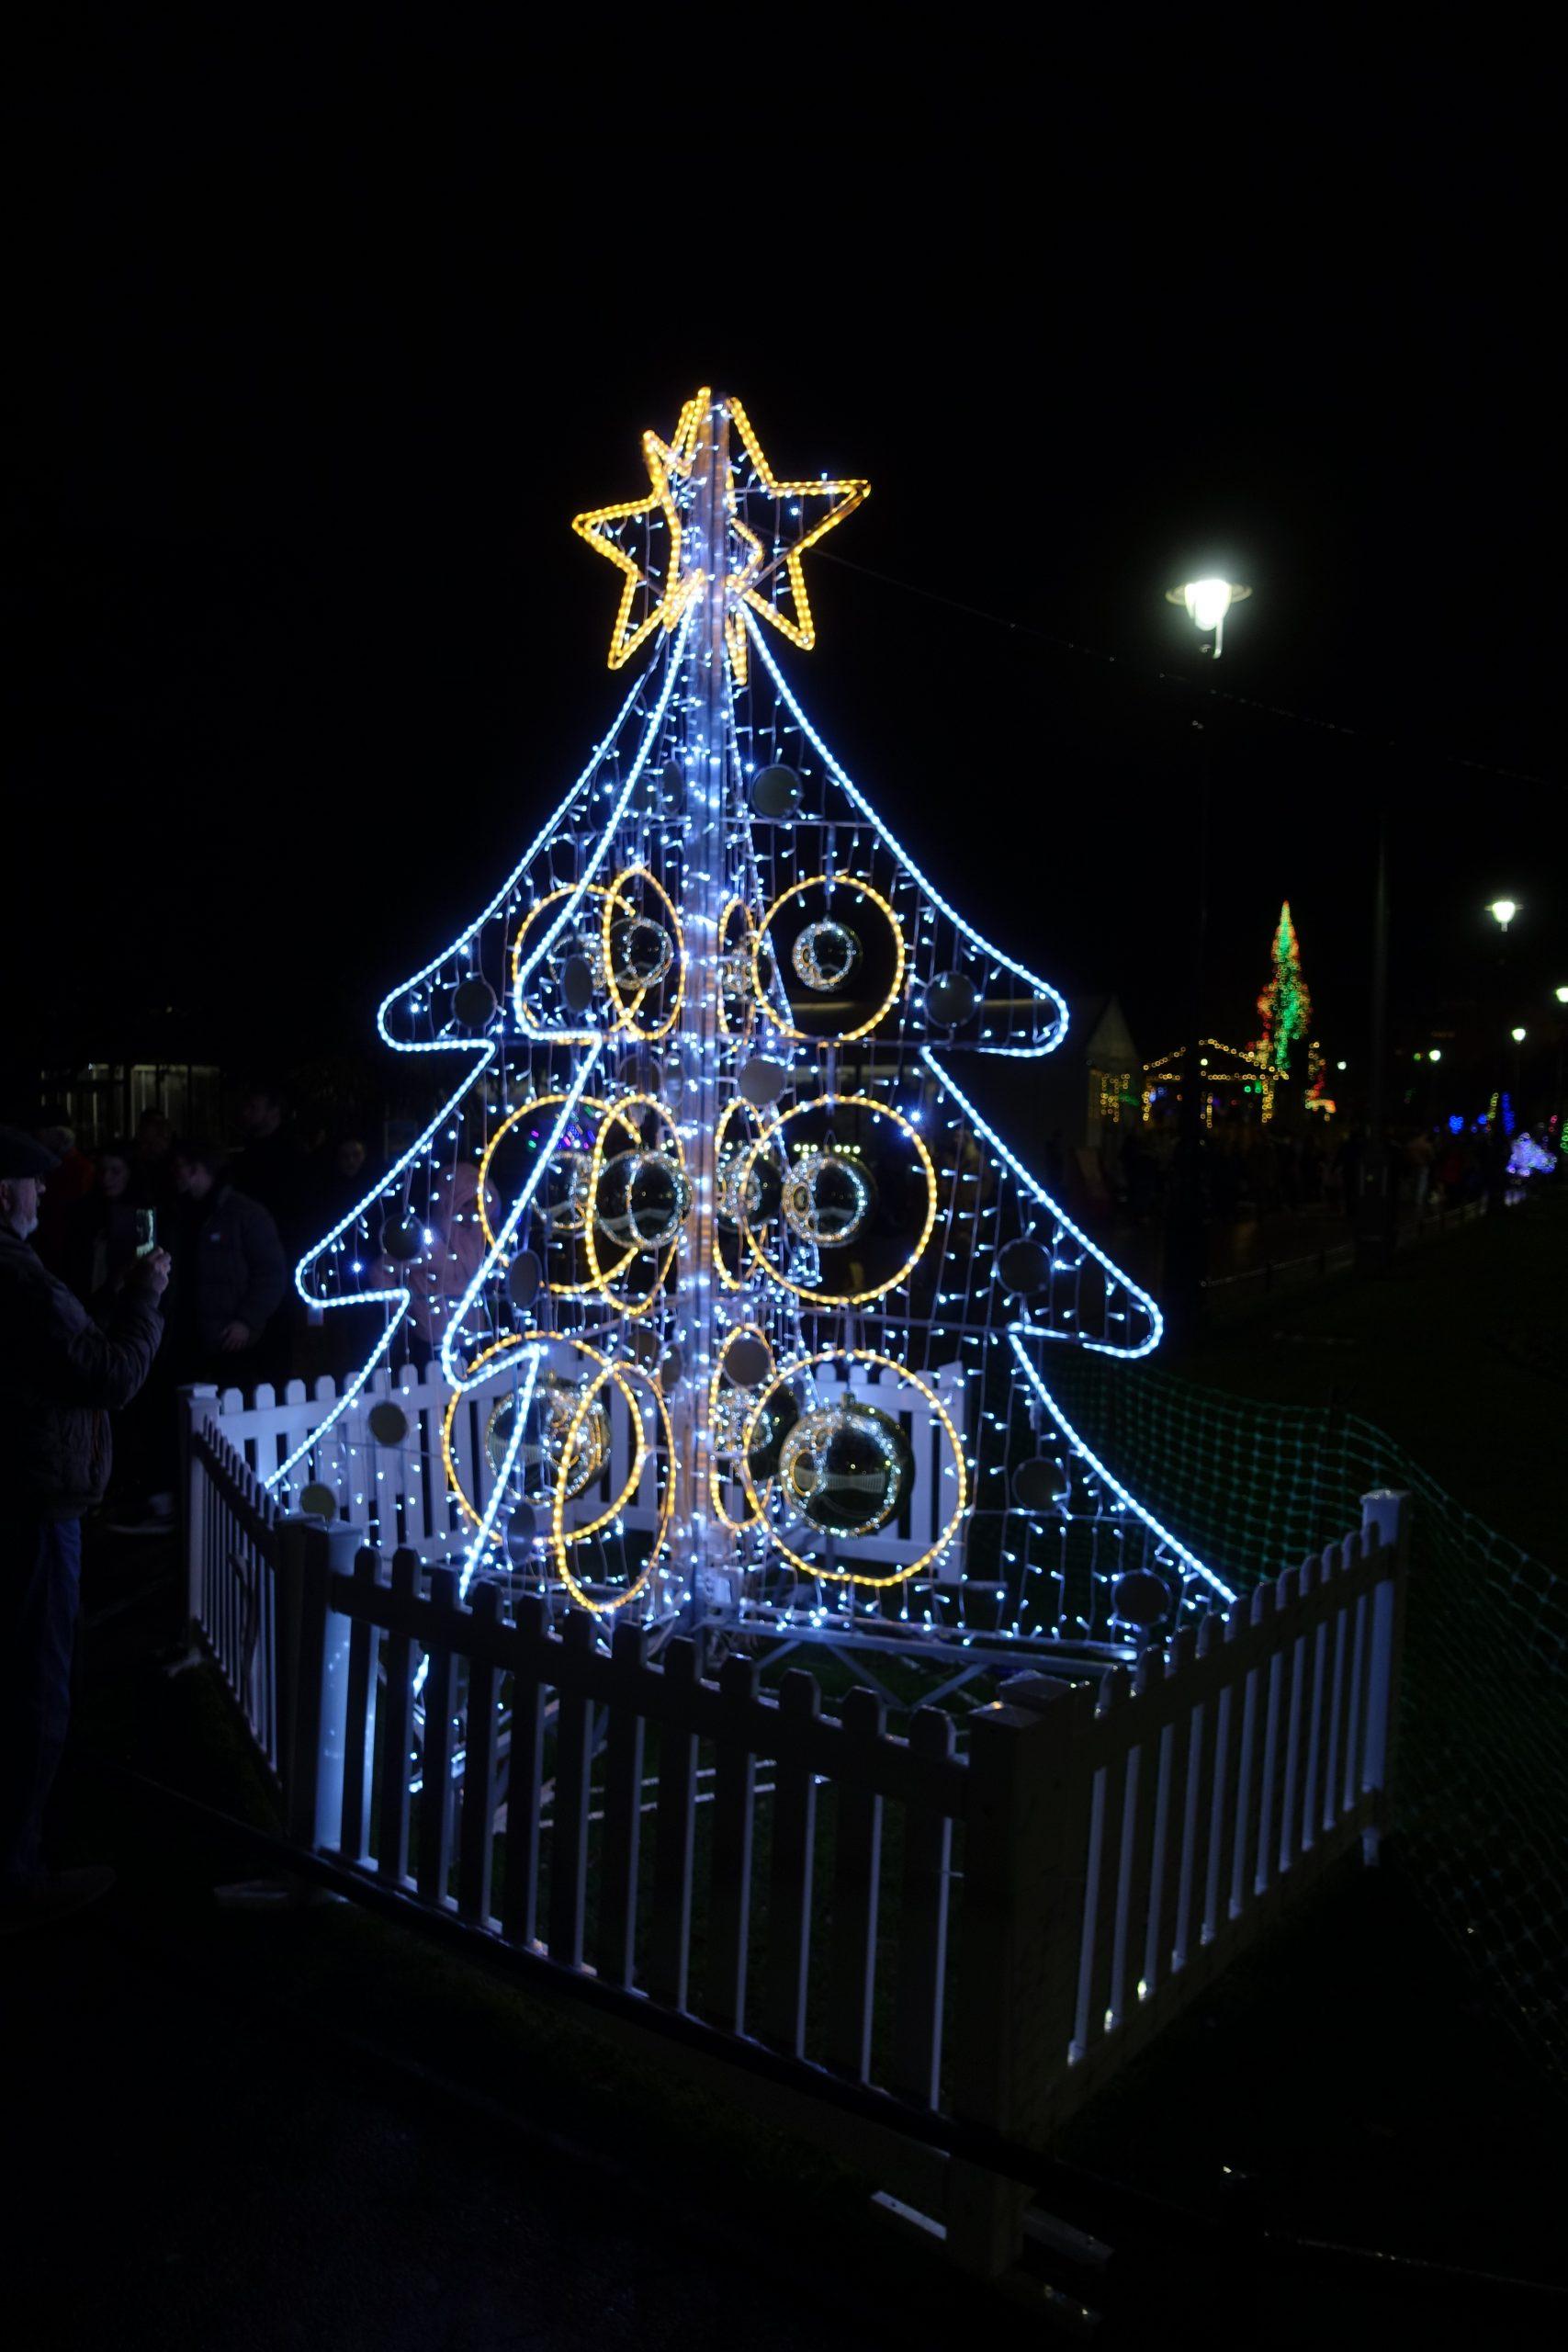 Christmas Tree Wonderland - photo by Juliamaud